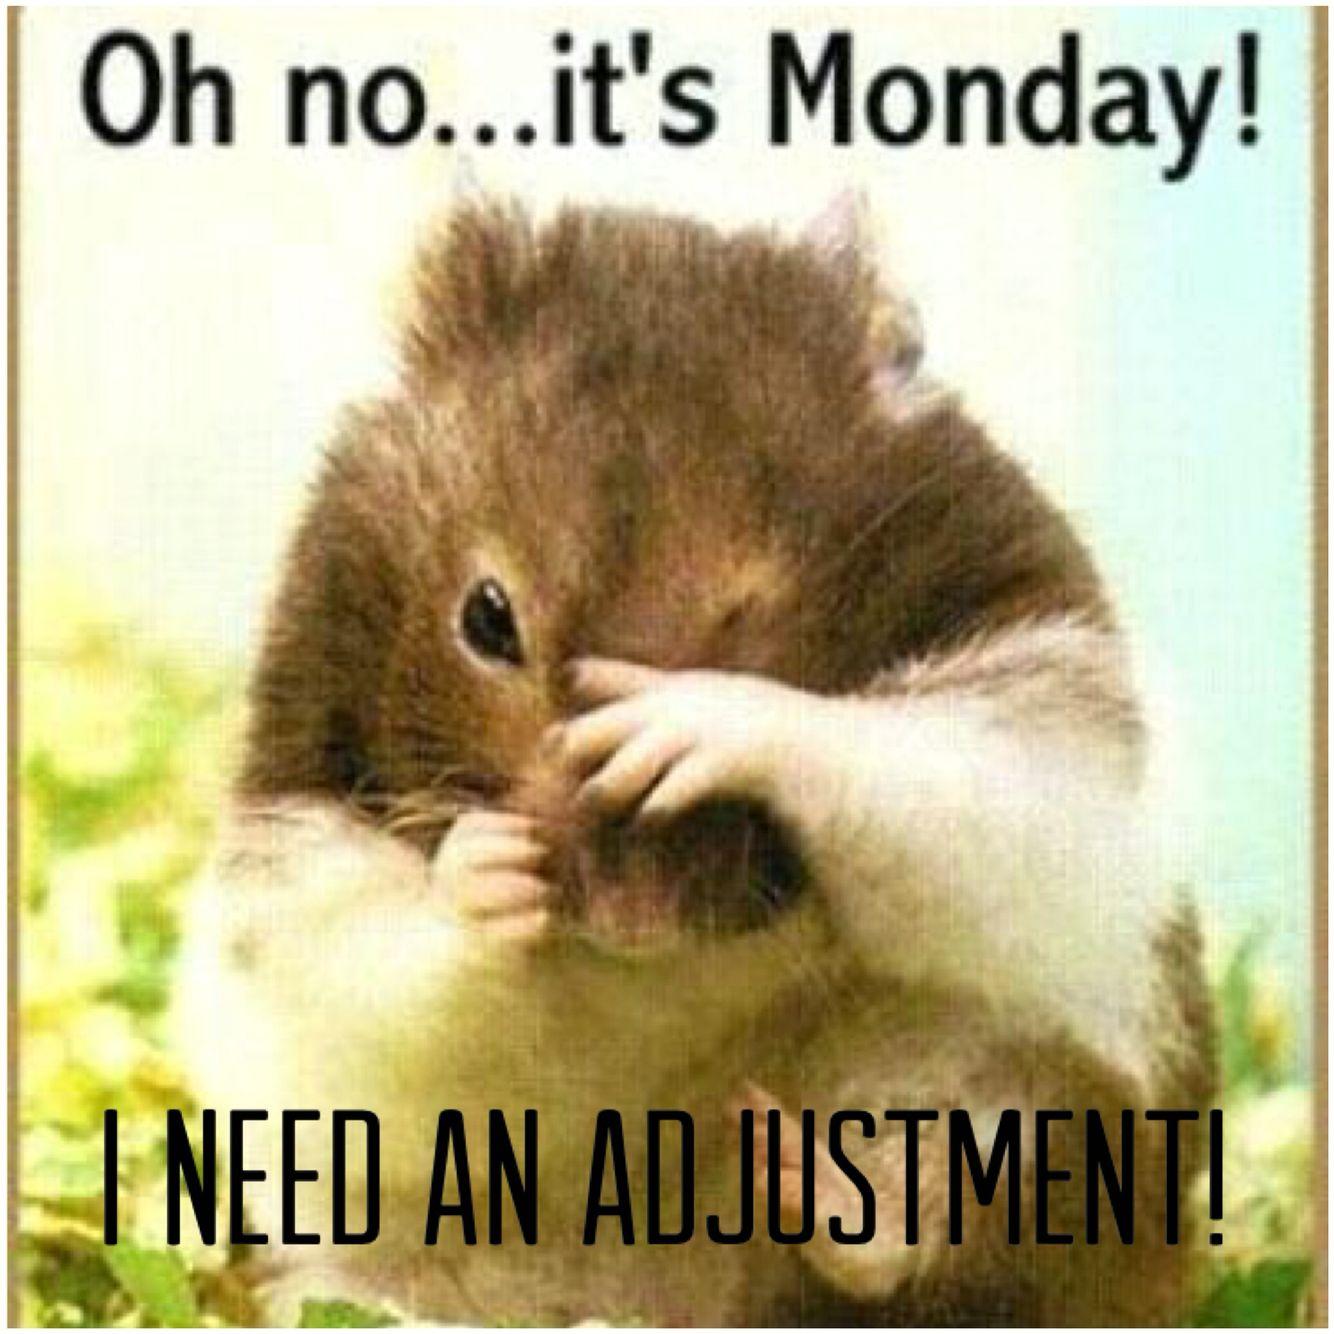 Djia Quote Pinwarren Wright On Monday's  Pinterest  Mondays